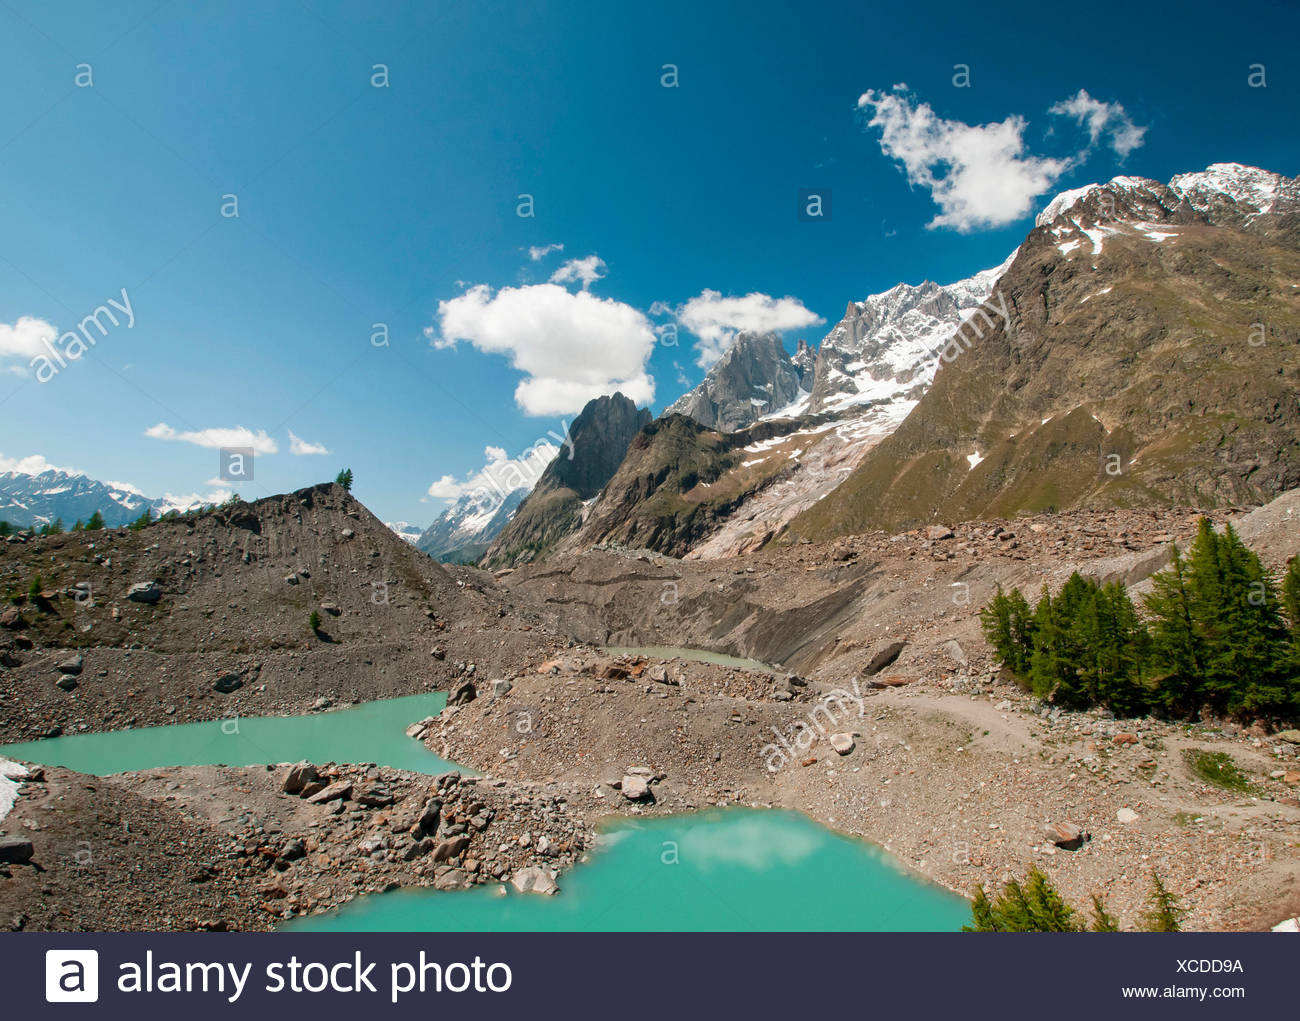 Europe, Italy, Valle d'Aosta, Glacier of Miage - Stock Image